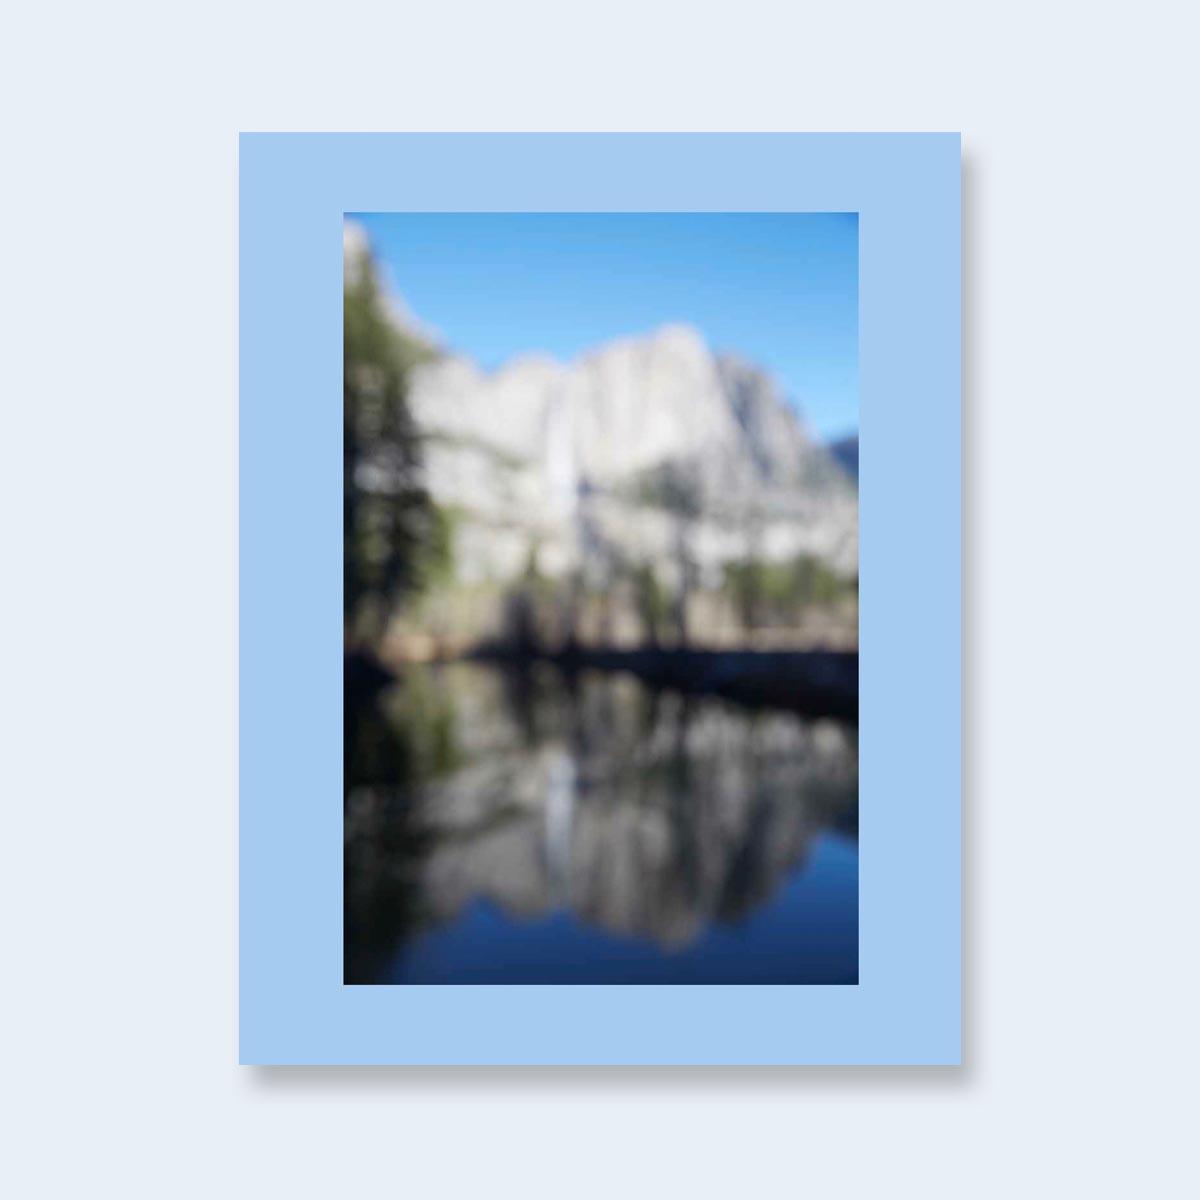 CATHERINE OPIE  |   Yosemite  |  Order >